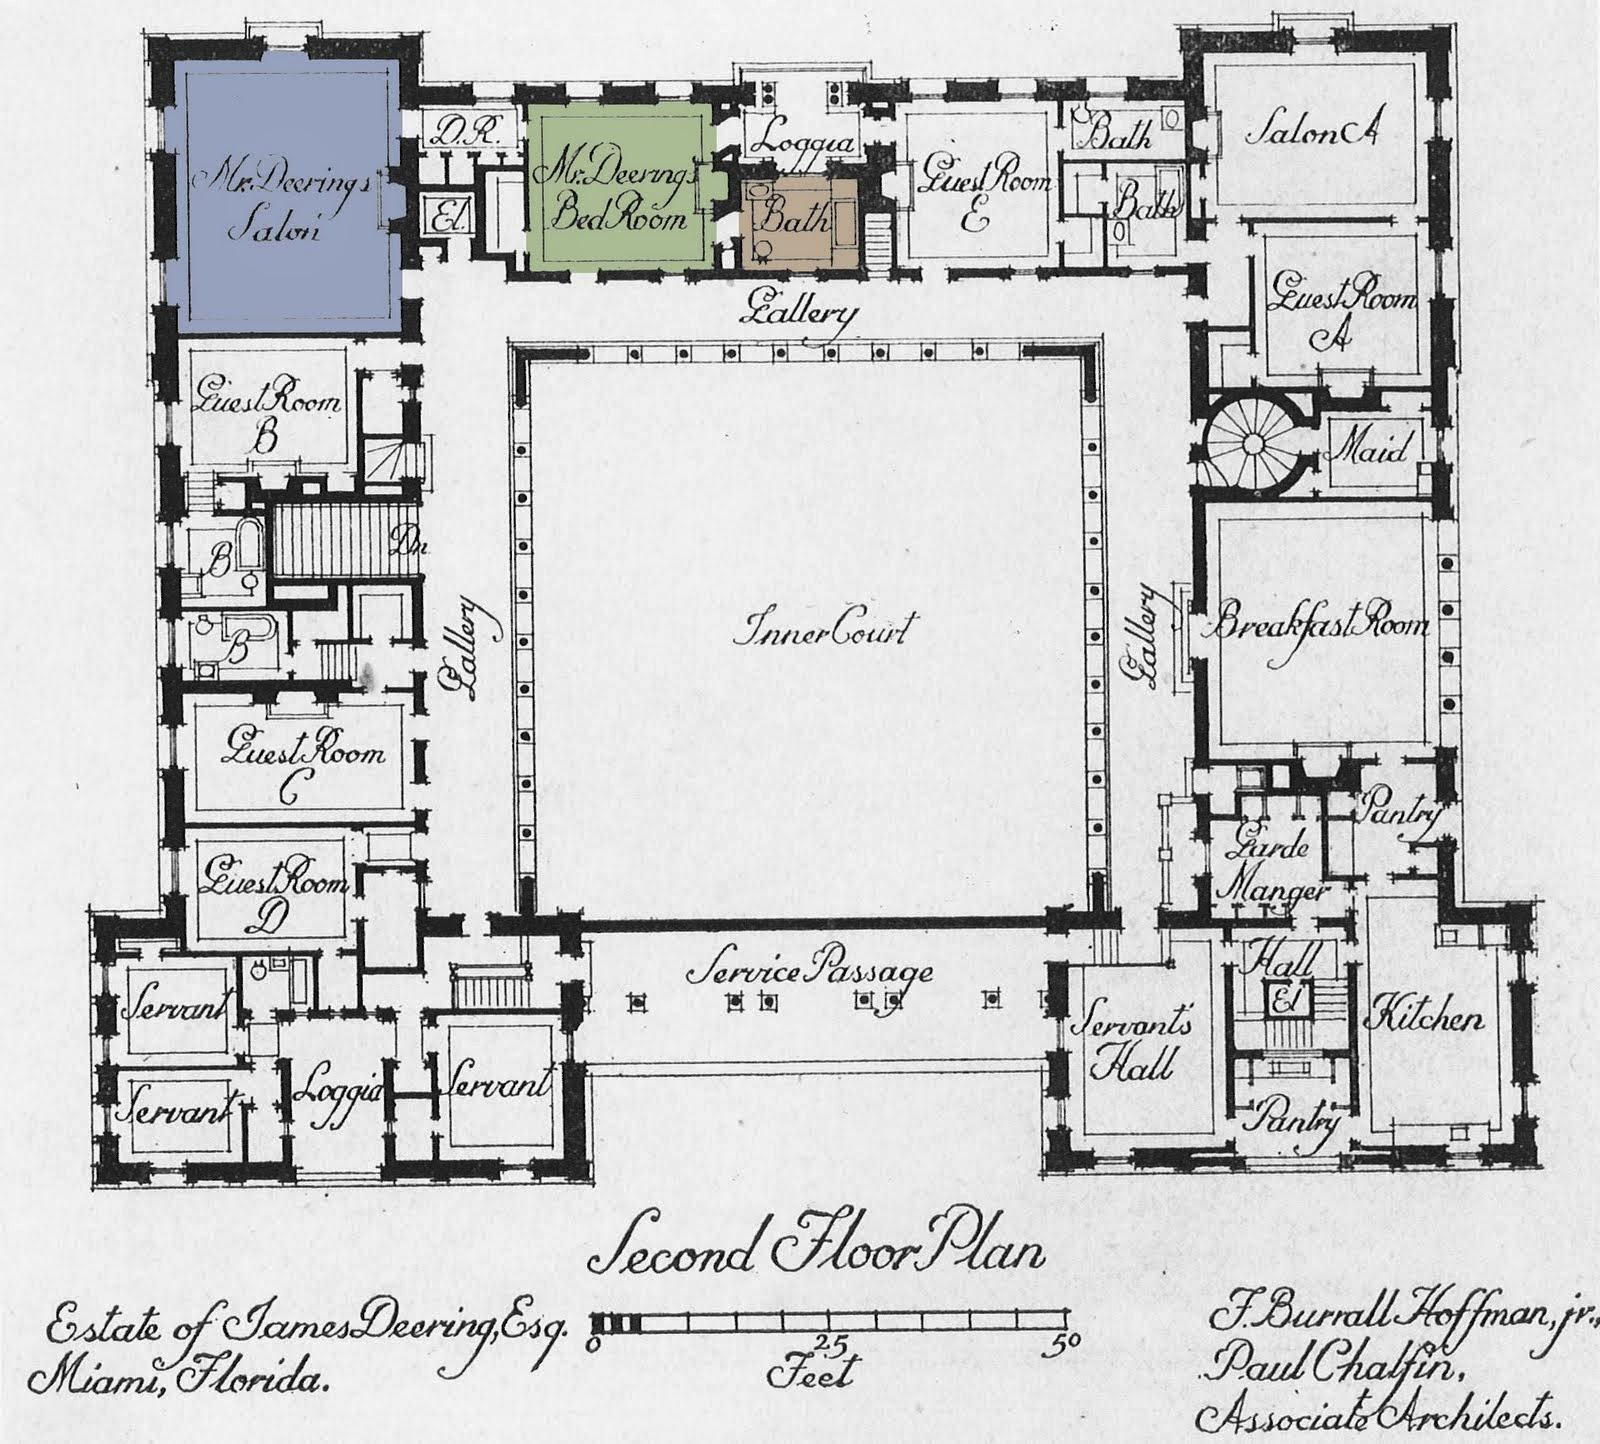 Art now and then villa vizcaya miami florida for Servant quarters designs